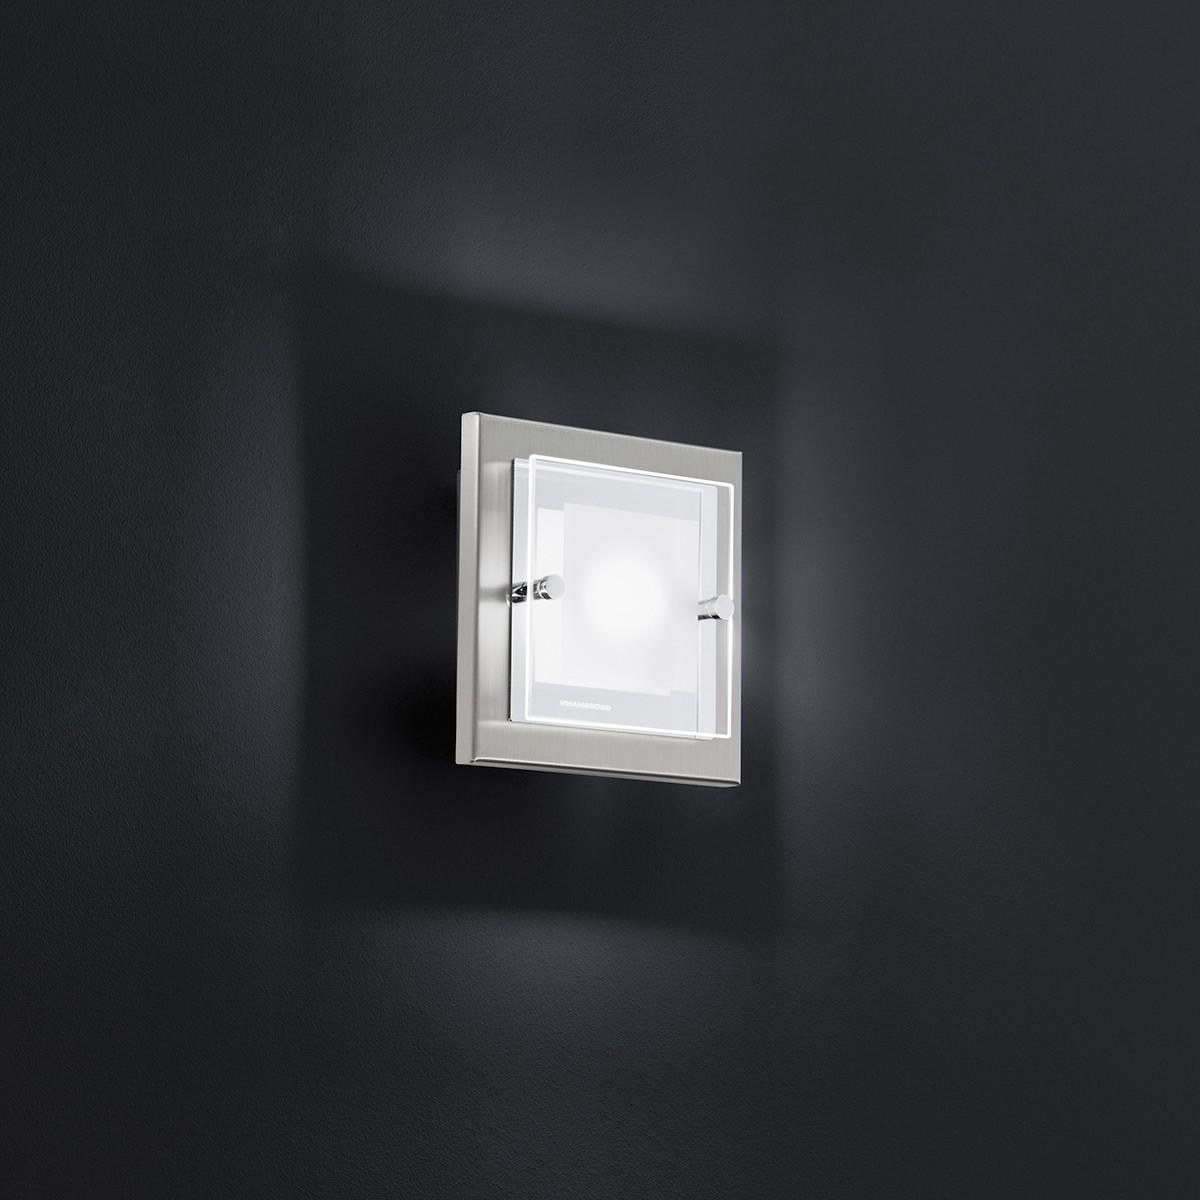 Grossmann Domino LED Wand- / Deckenleuchte, Nickel matt, 16 x 16 cm